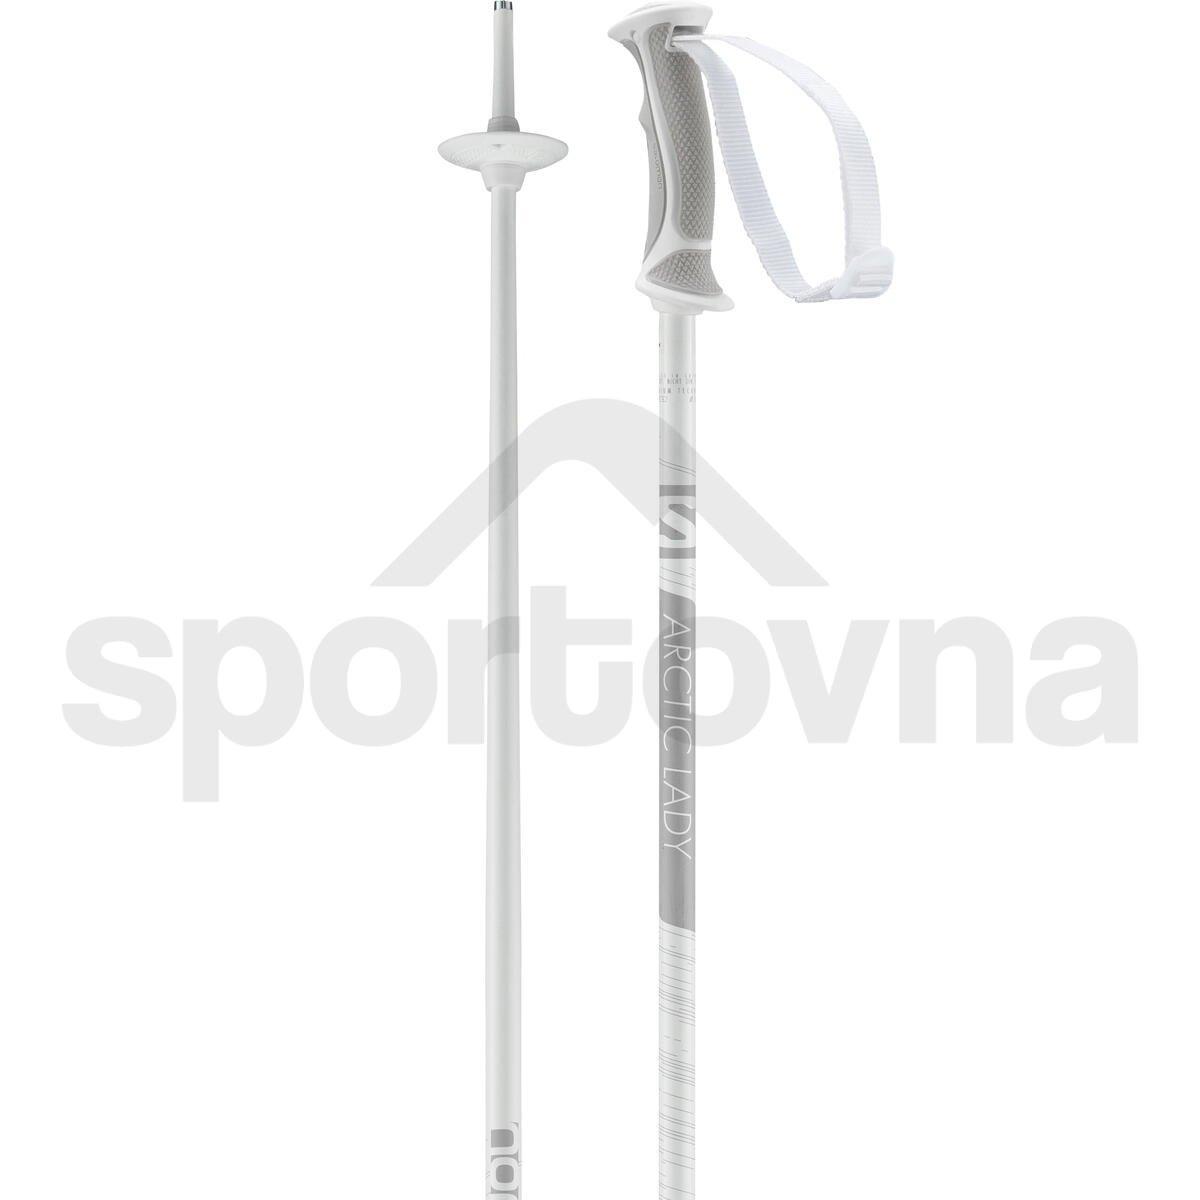 l41174300-1-gho-arctic-lady-white-grey-jpg-cq5dam-web-1200-1200